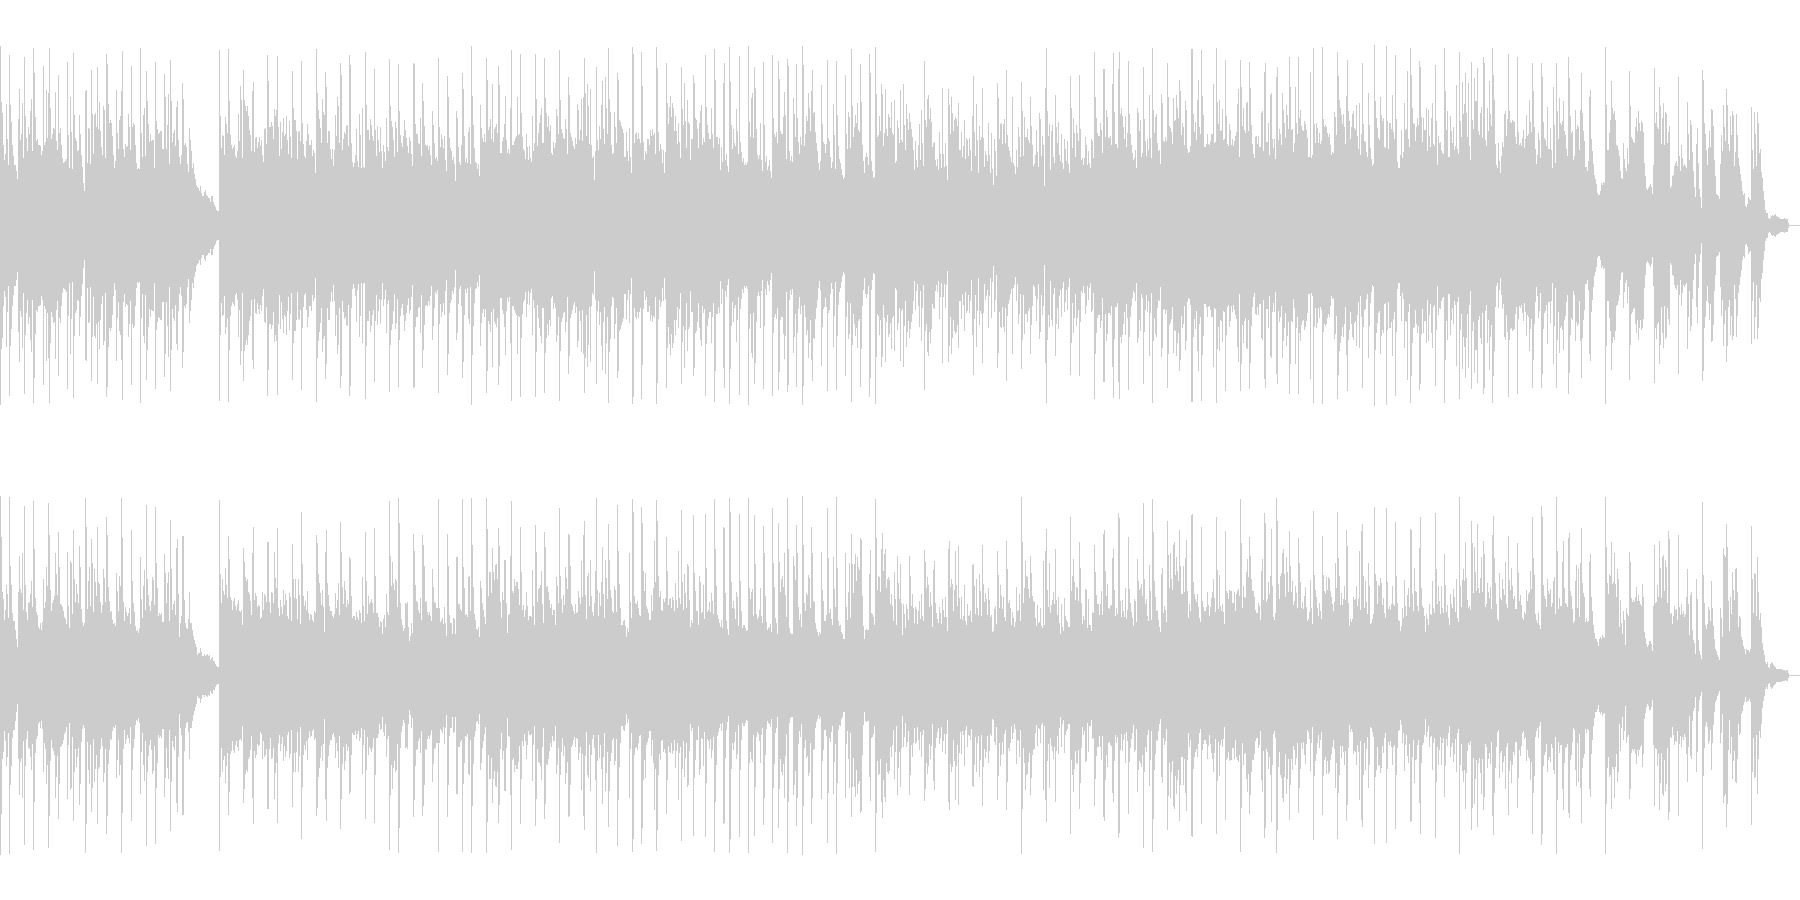 BGM016-03 ピアノとギターの落…の未再生の波形